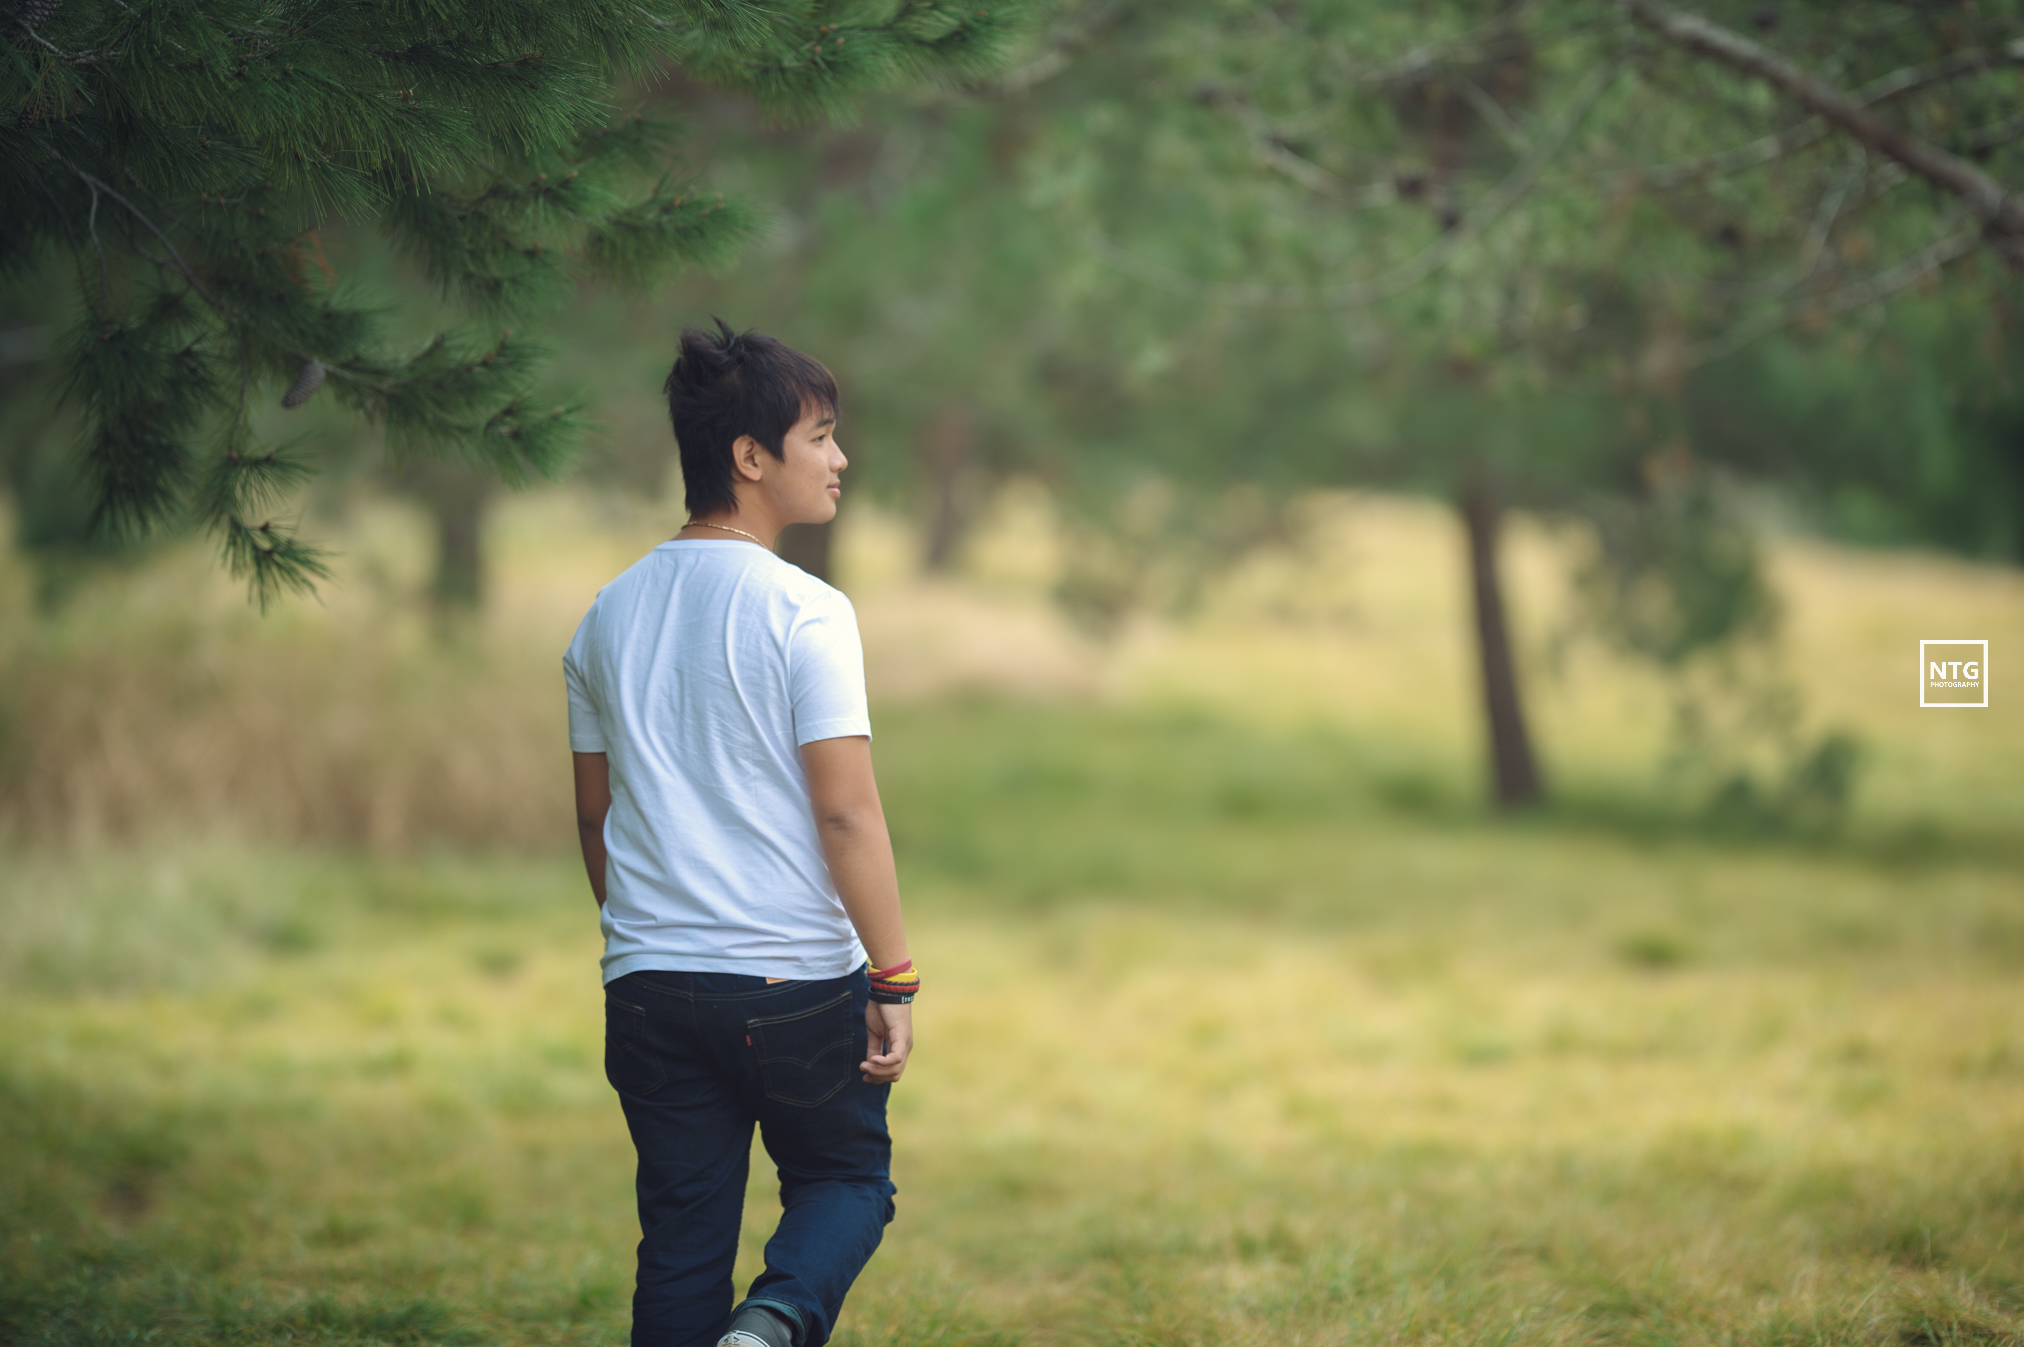 _NTG4613-Edit